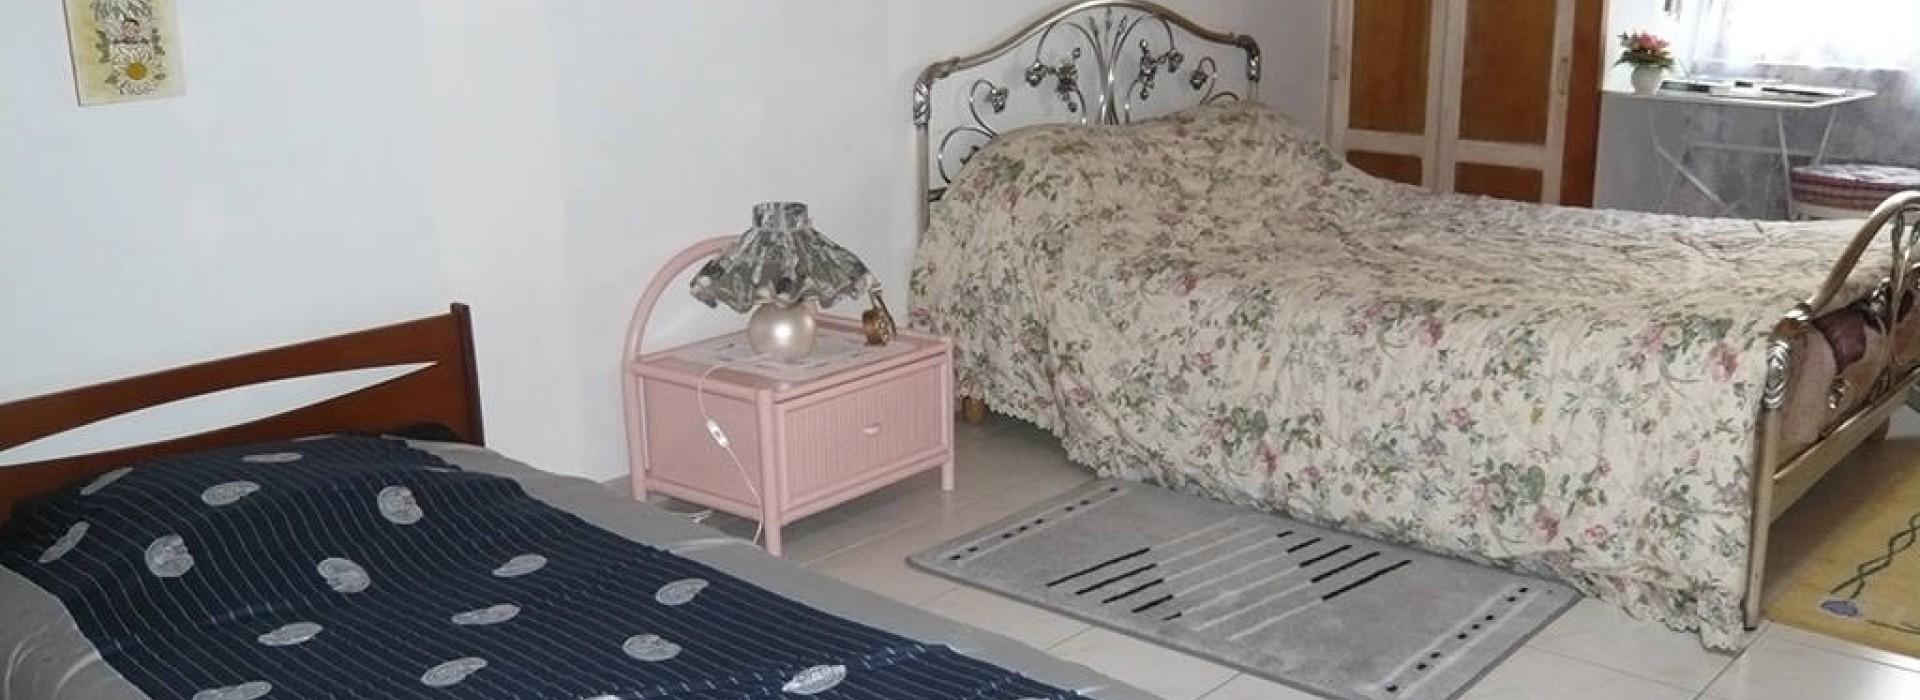 chambres d 39 hotes flamant laurence bed and breakfast frankrijk pays de la loire. Black Bedroom Furniture Sets. Home Design Ideas